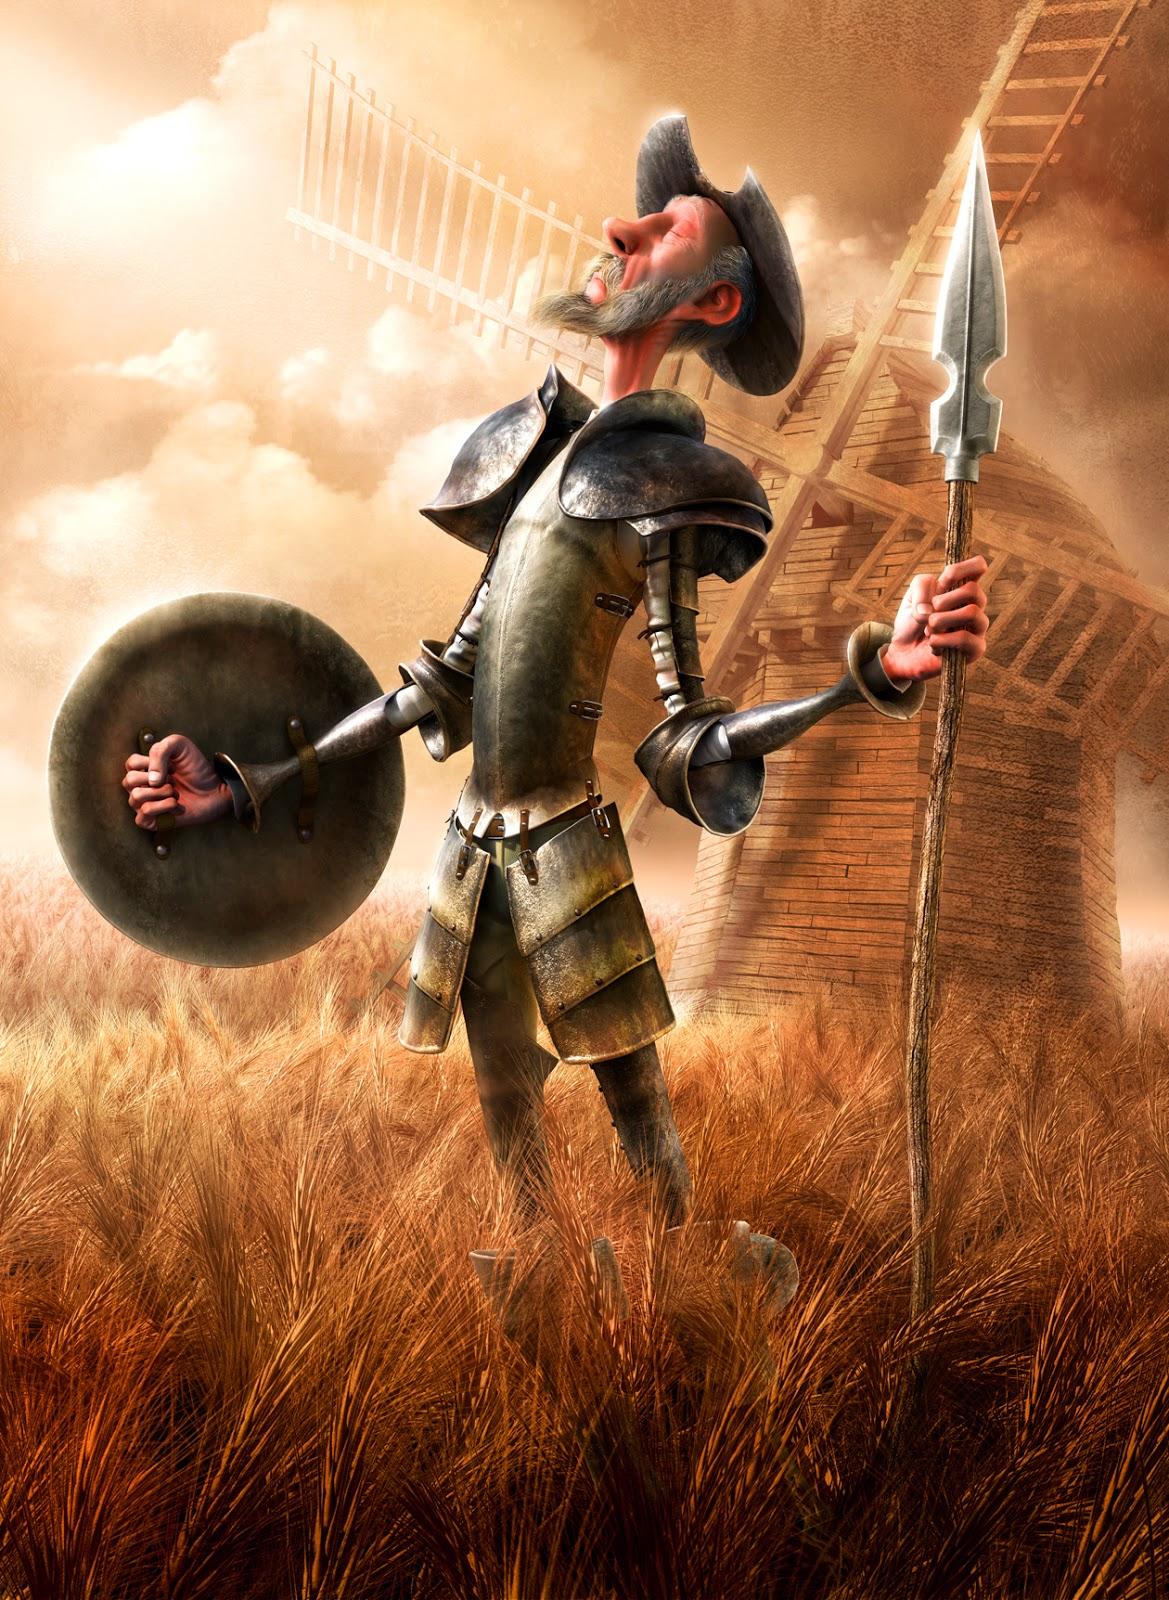 O Engenhoso Fidaldo Dom Quixote de La Mancha